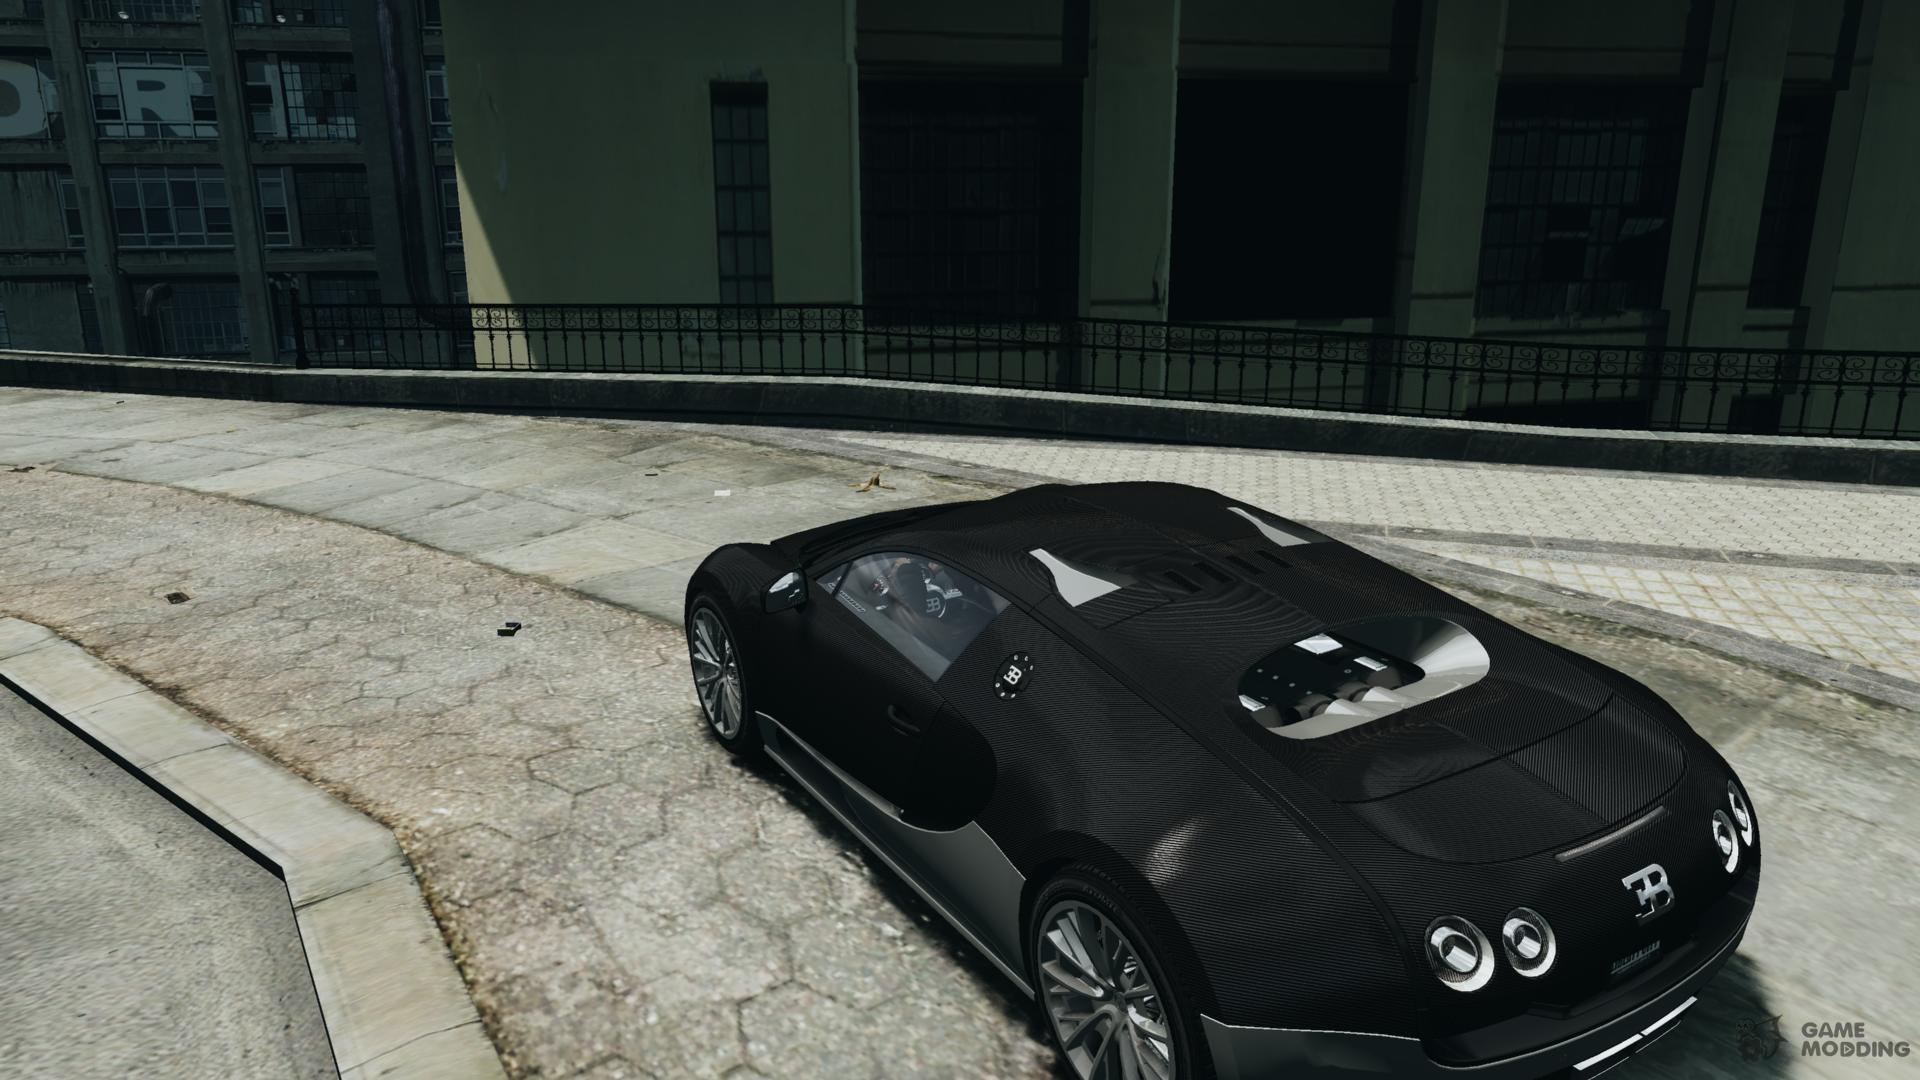 02de10de14a2790939fb4c6eb9e166f7b06b682ad924dc46289f8df1afe15a7e Wonderful Bugatti Veyron Xbox 360 Games Cars Trend